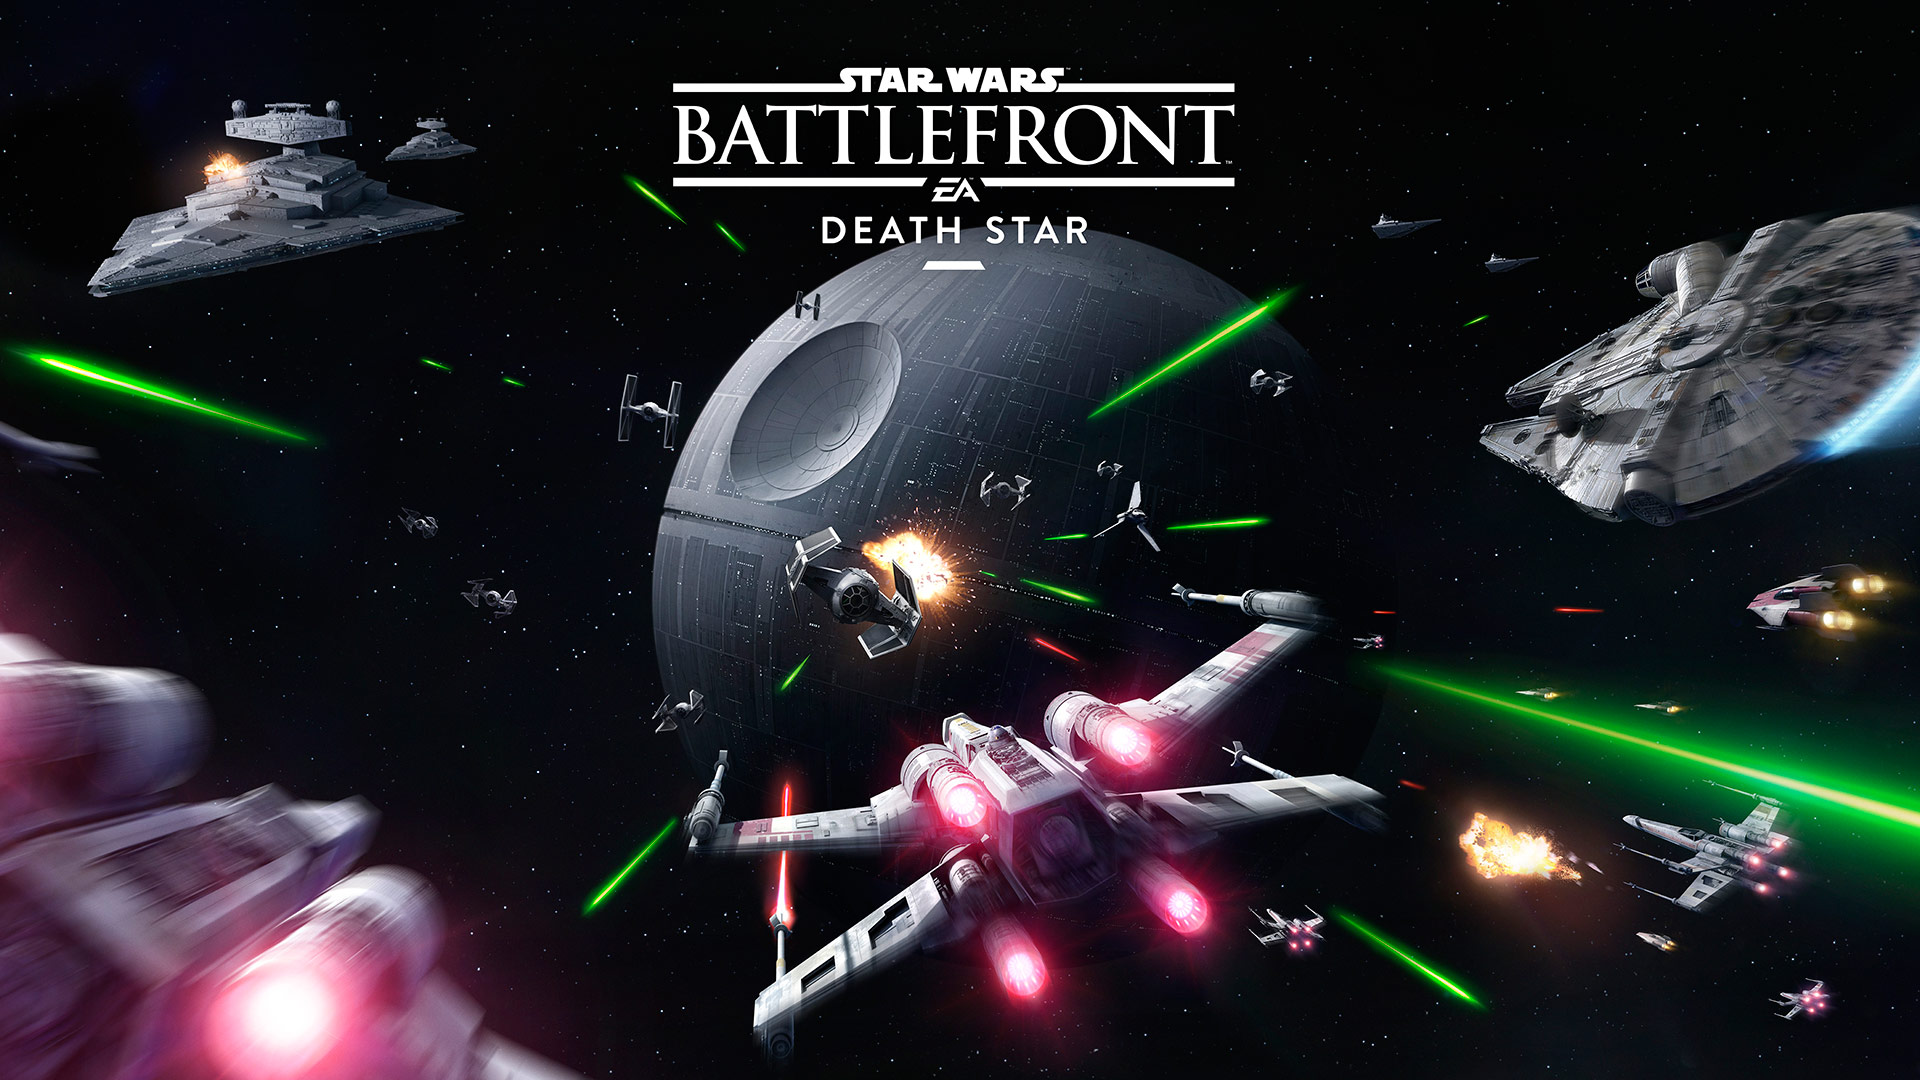 Star Wars Battlefront Battle Of Jakku Dlc Pack Out Now Diskingdom Com Disney Marvel Star Wars Merchandise News